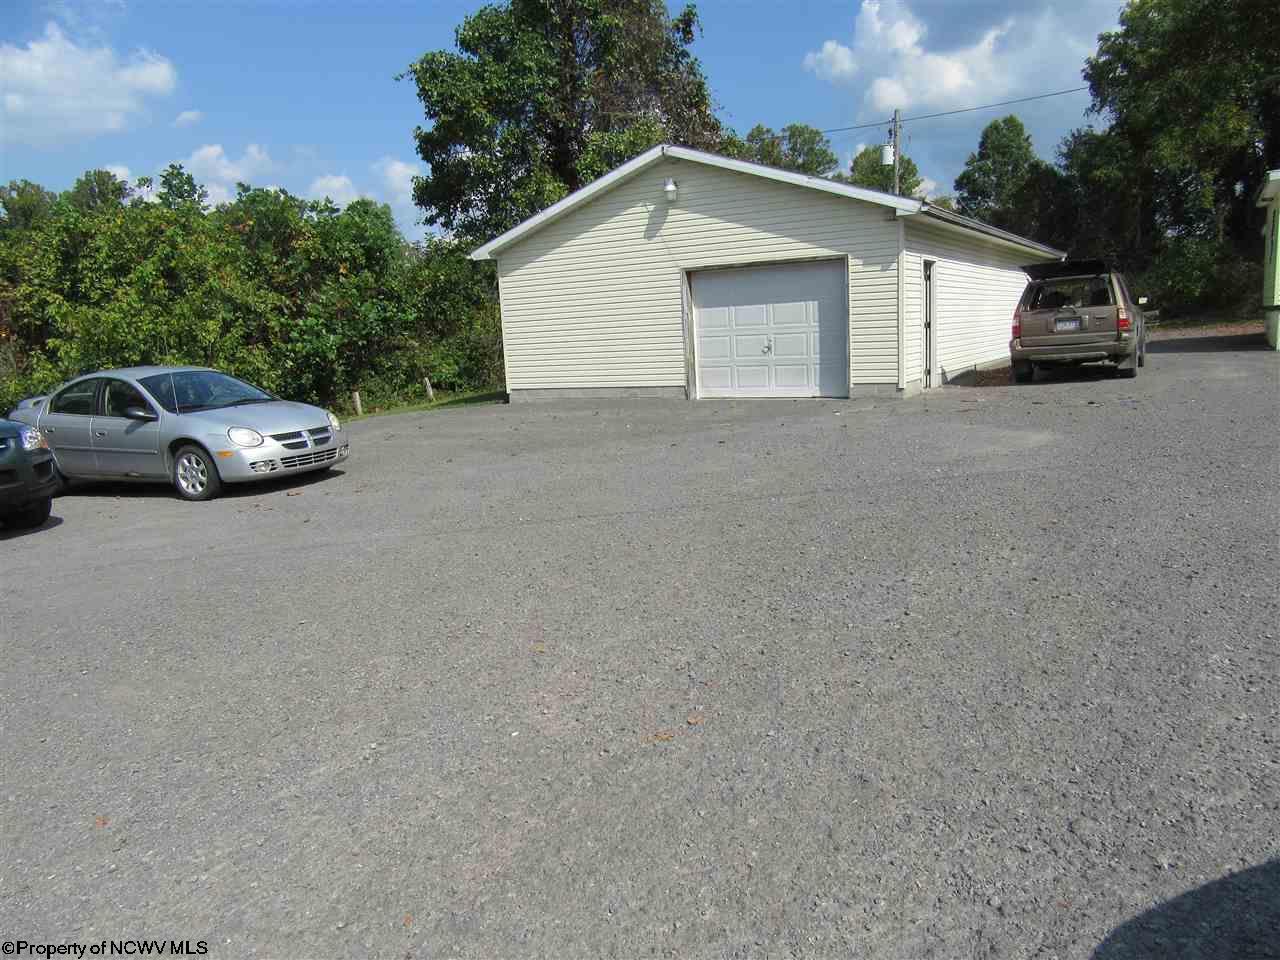 486 HAMPTON ROAD, FAIRMONT, WV 26554  Photo 4